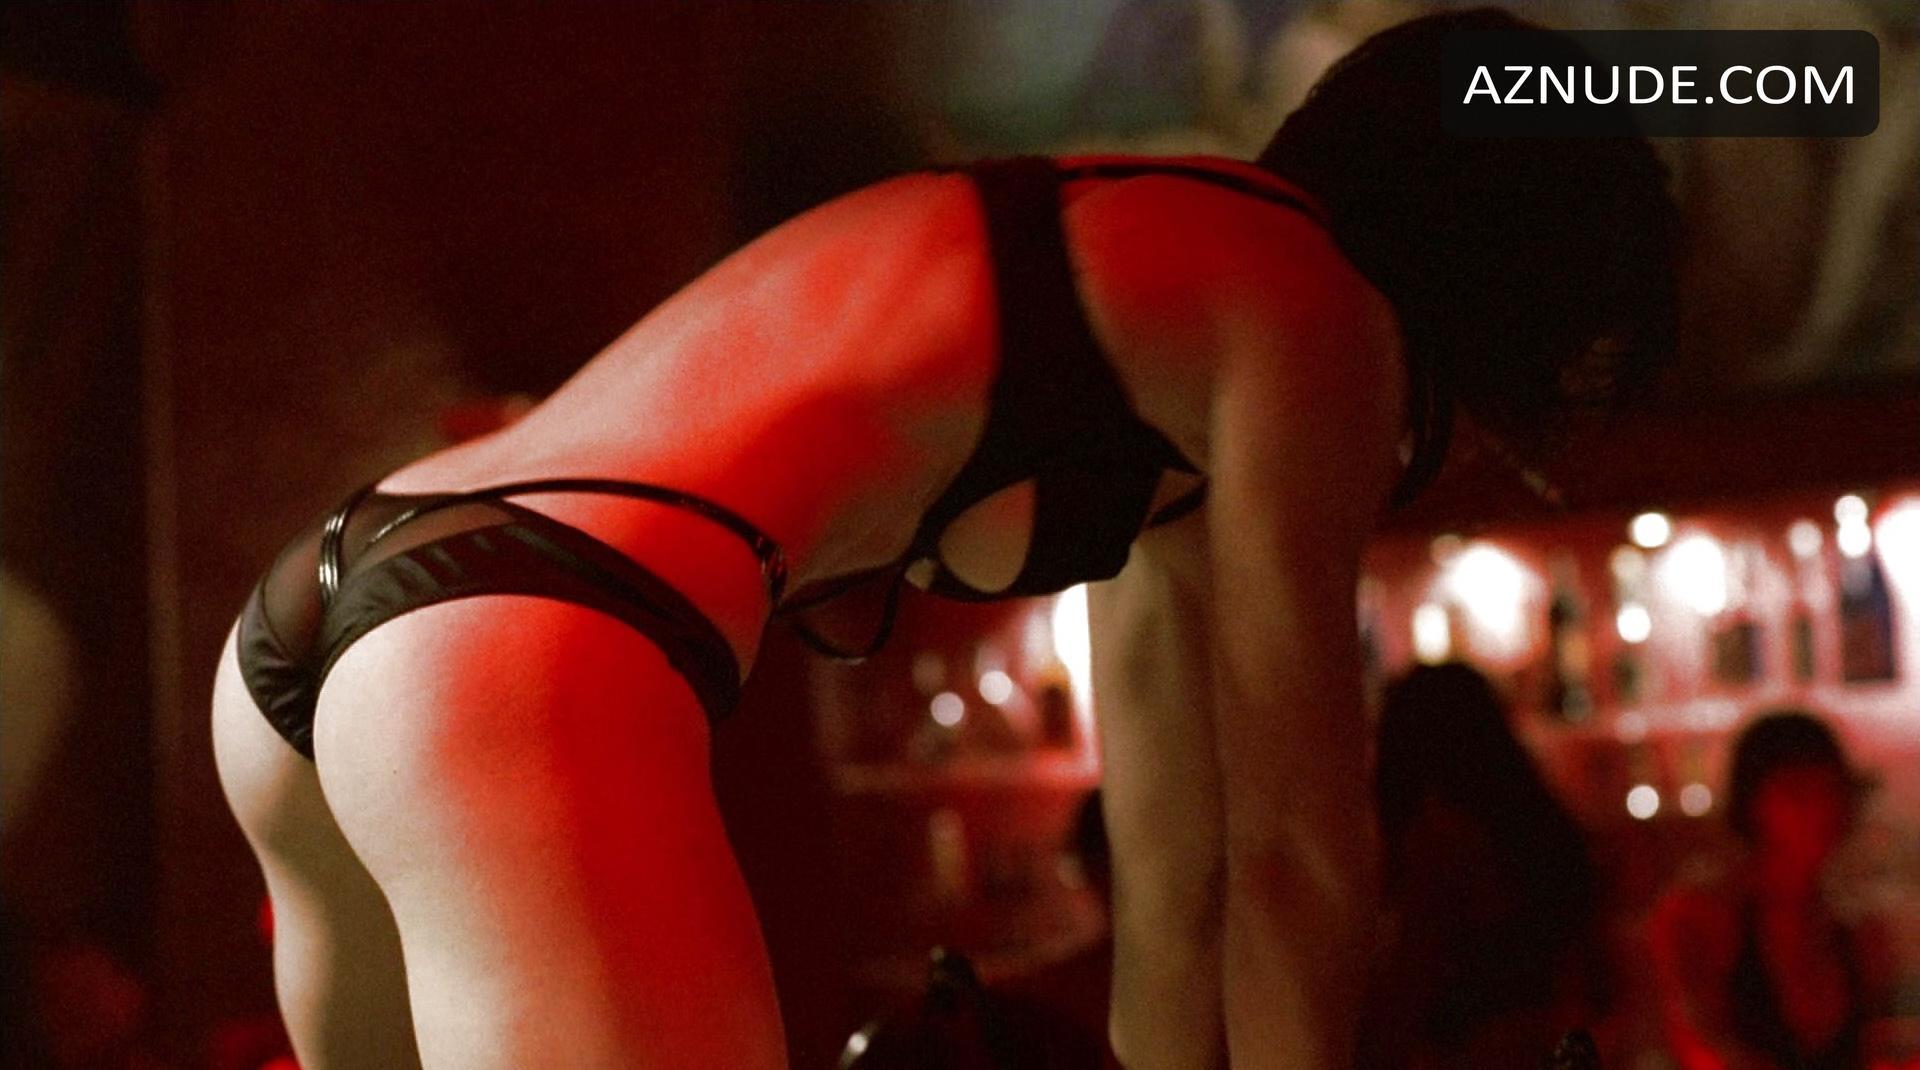 Jessica biel powder blue nude scene